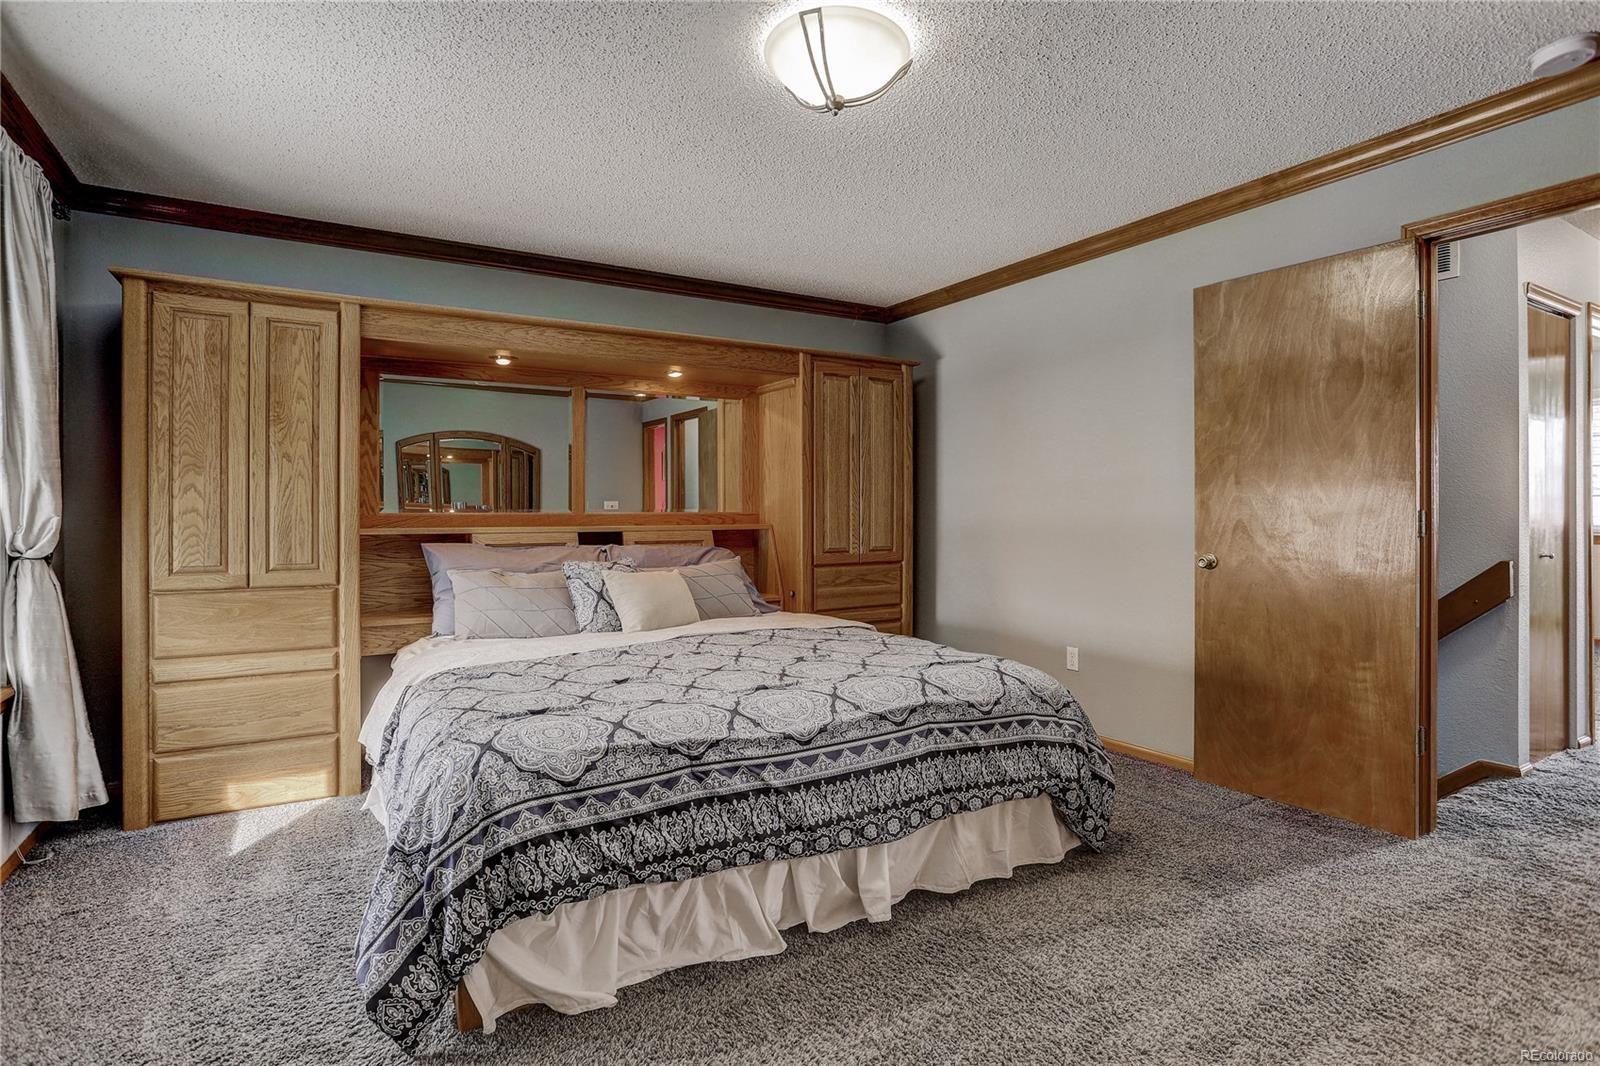 MLS# 9576808 - 20 - 2130 Gold Dust Lane, Highlands Ranch, CO 80129